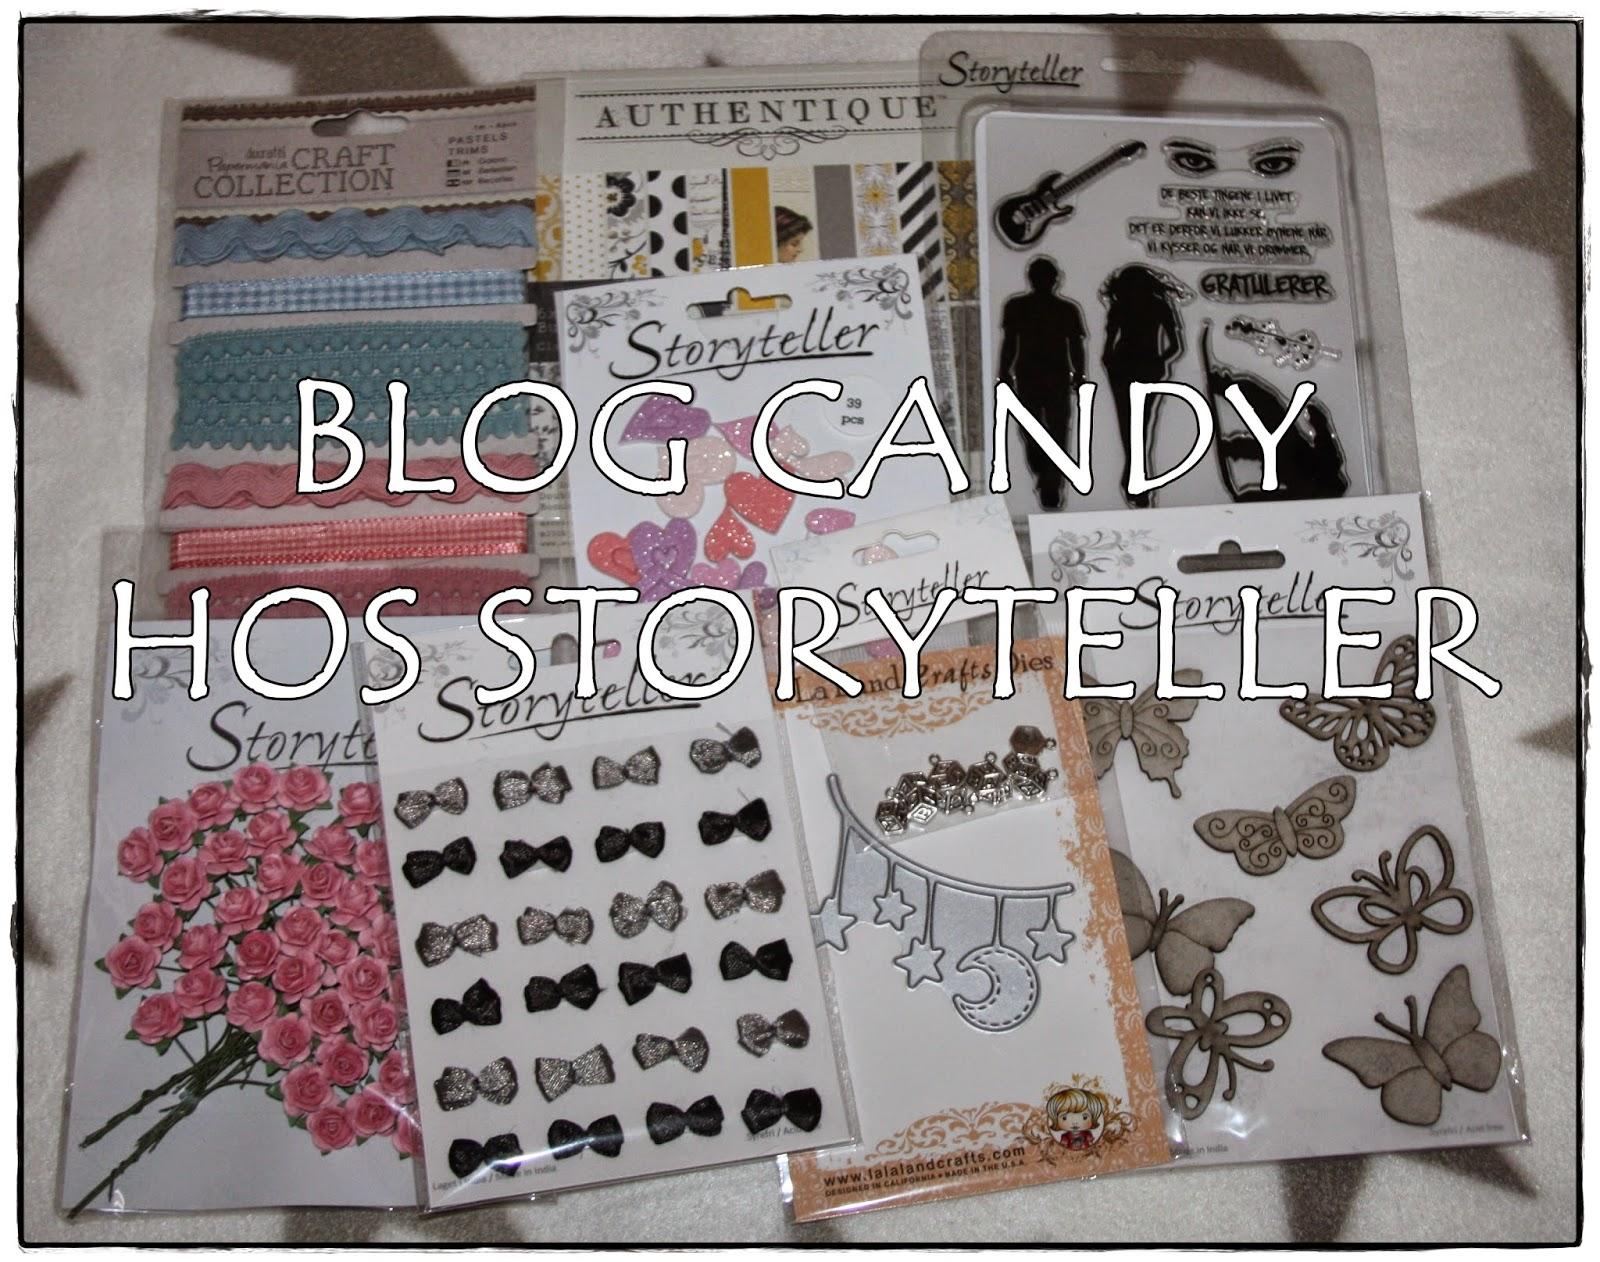 Blog Candy hos Storyteller